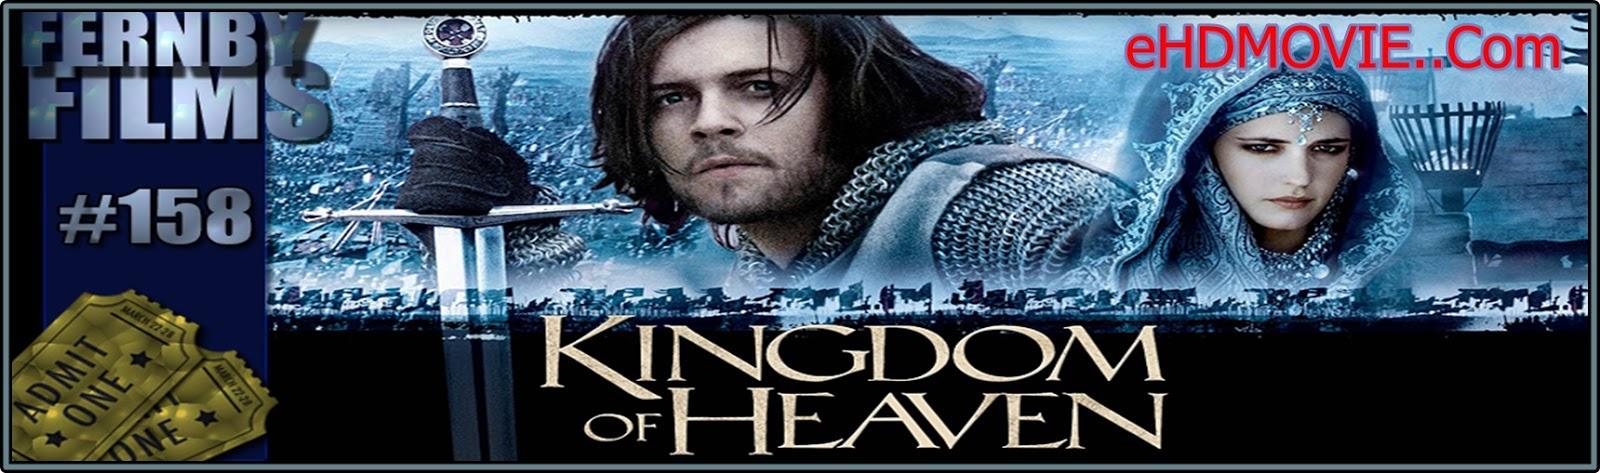 Kingdom of Heaven 2005 Full Movie Dual Audio [Hindi – English] 720p - 480p ORG BRRip 450MB - 1.2GB ESubs Free Download